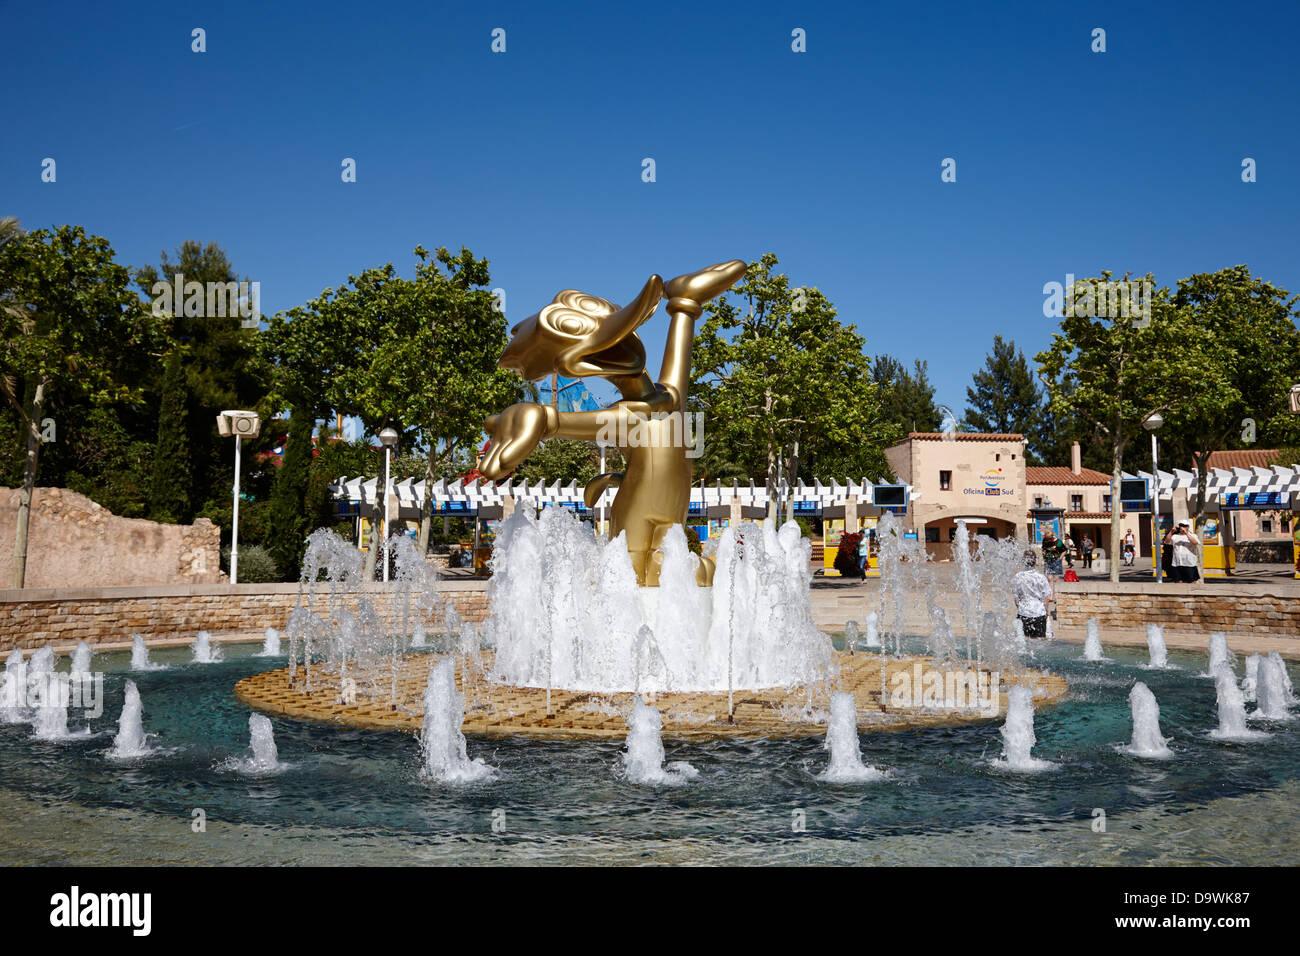 woody woodpecker fountain at entrance to portaventura theme park salou, catalonia, spain - Stock Image